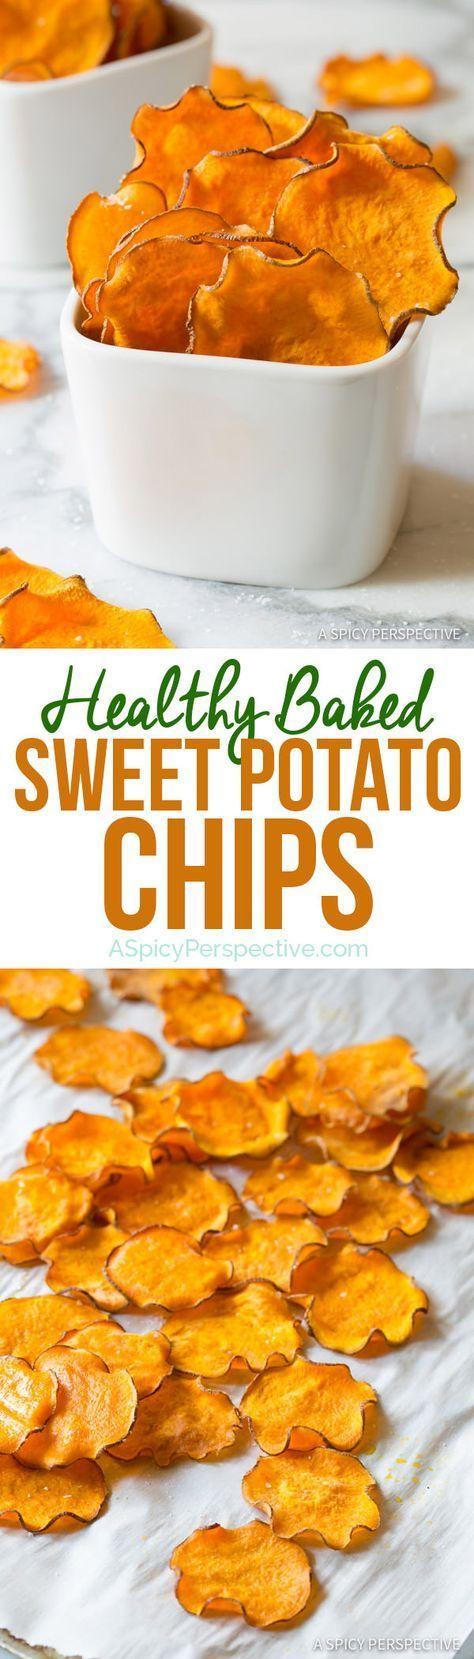 Healthy 3-Ingredient Baked Sweet Potato Chips Recipe (Vegan, Paleo & Gluten Free!)